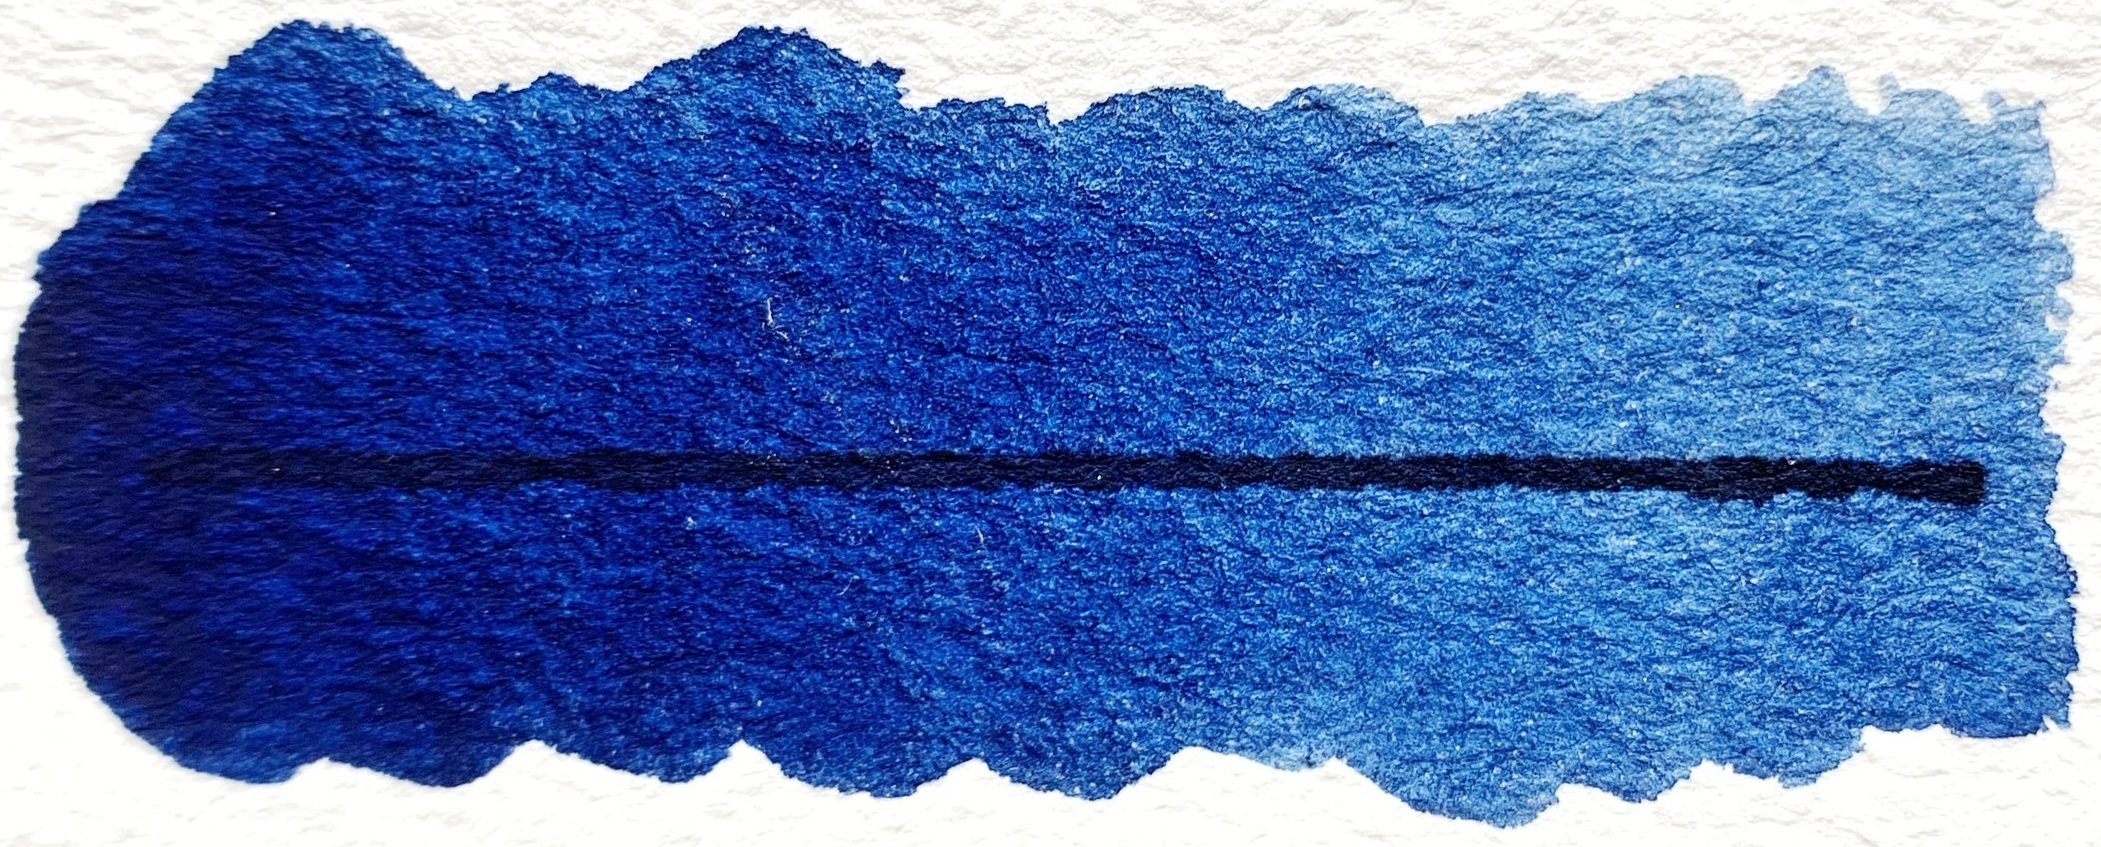 Antwerp Blue - PB27, PW22, transparent, good lightfastness, staining